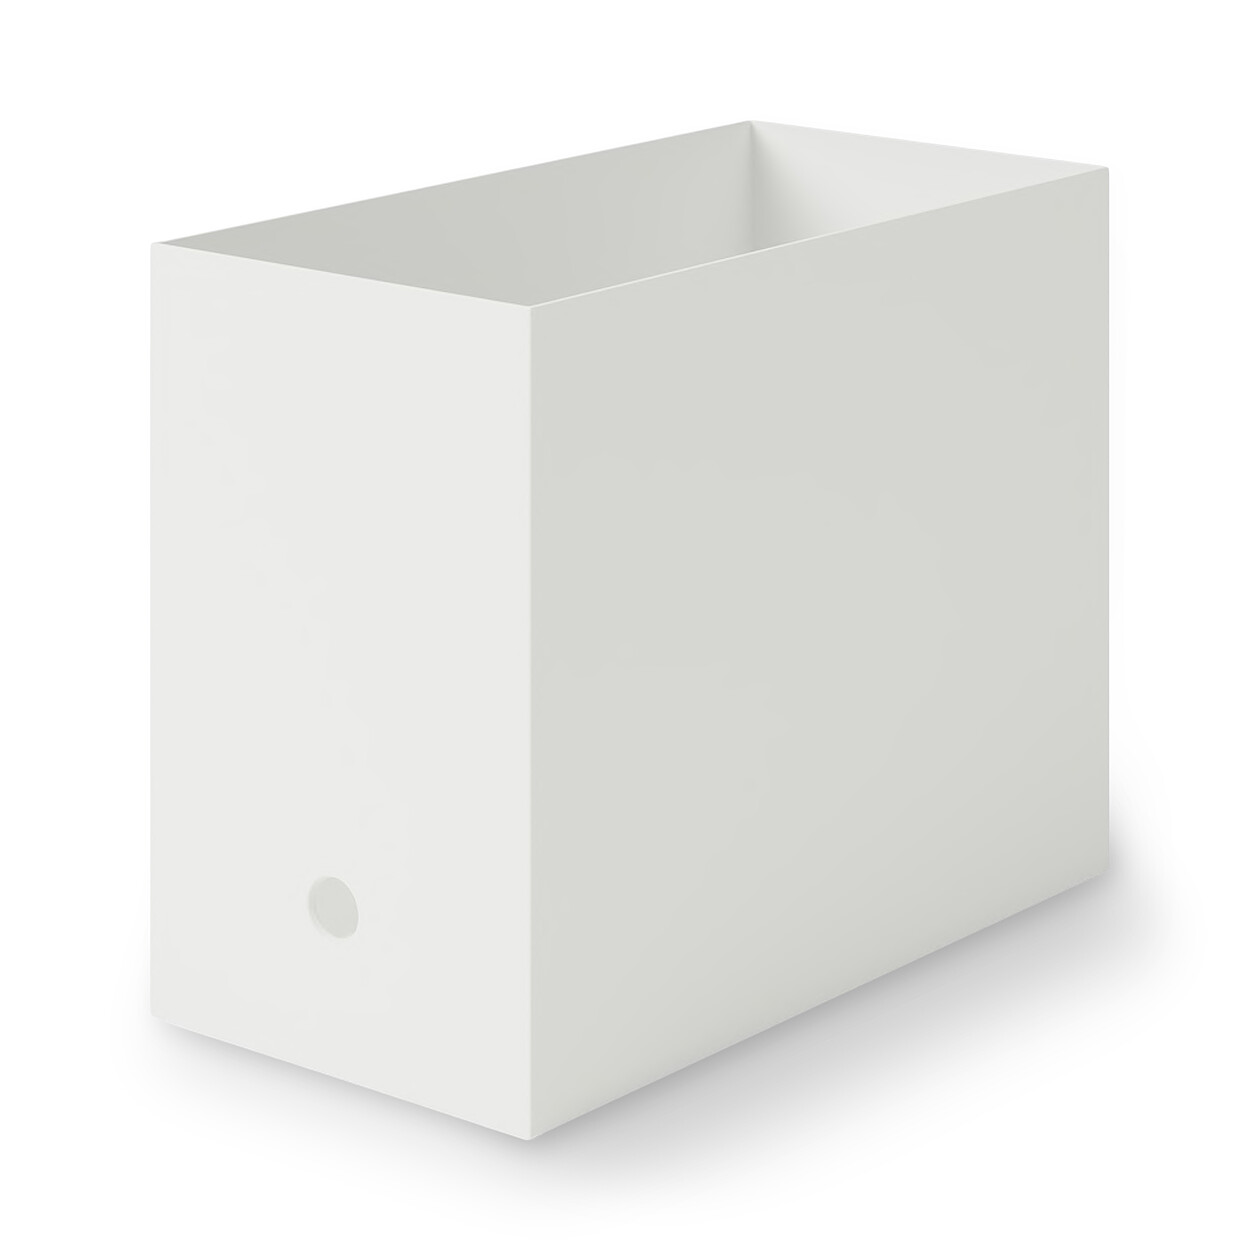 RoomClip商品情報 - ポリプロピレンファイルボックス・スタンダードタイプ・ワイド・A4用ホワイトグレー